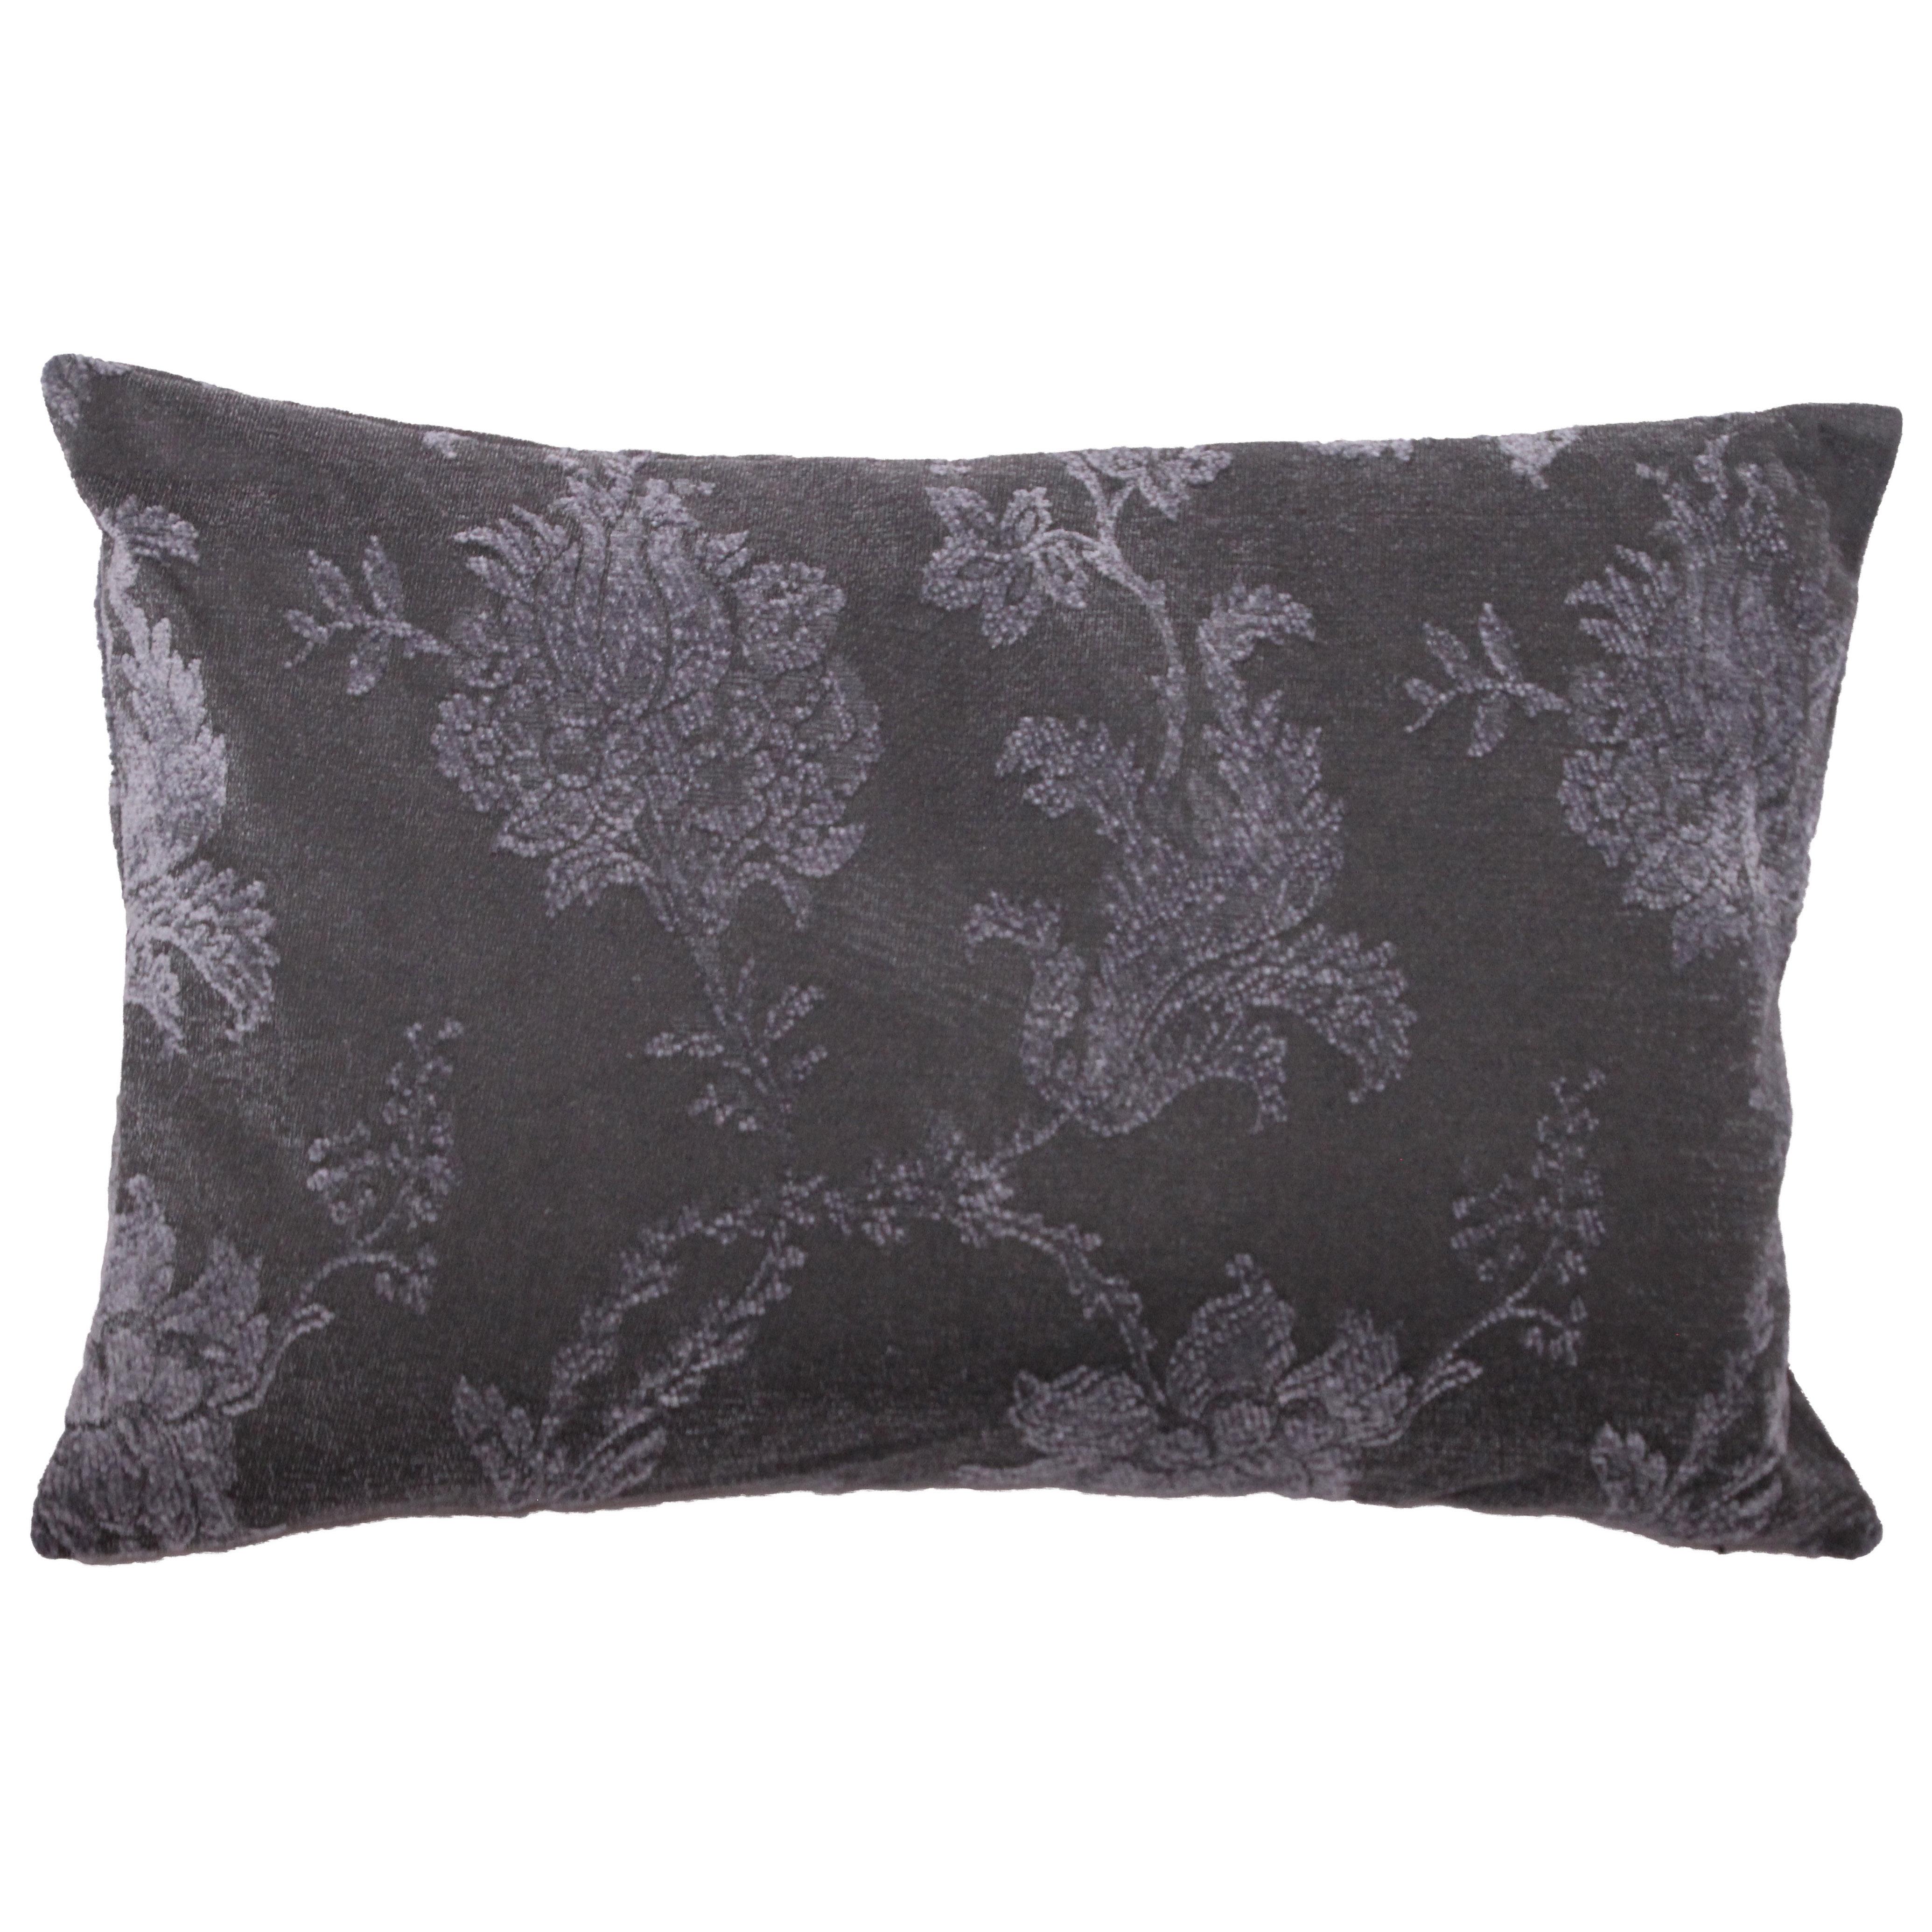 kissenh lle bluestone 40x60 lazis. Black Bedroom Furniture Sets. Home Design Ideas